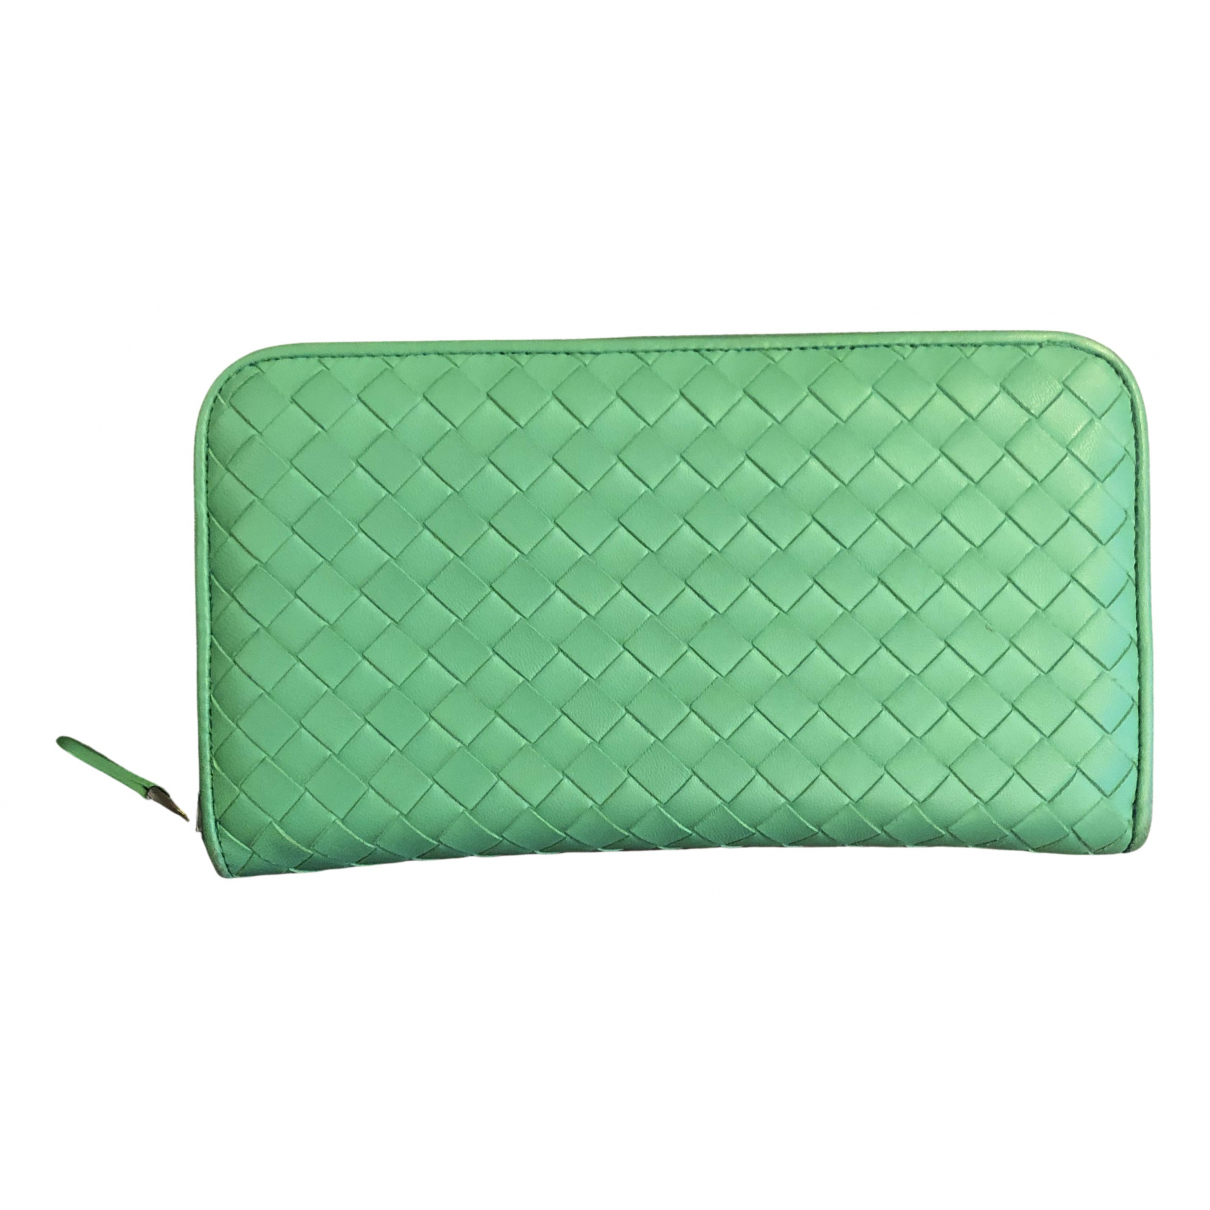 Bottega Veneta - Portefeuille Intrecciato pour femme en cuir - vert